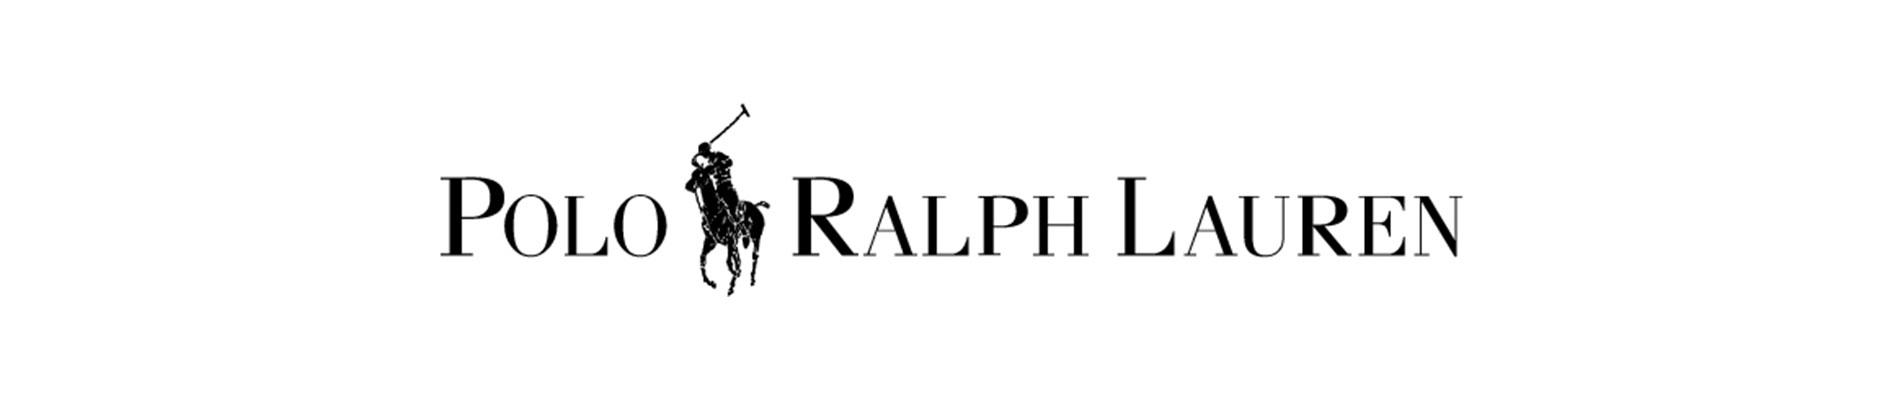 polo ralph lauren eyewear designer frame logo